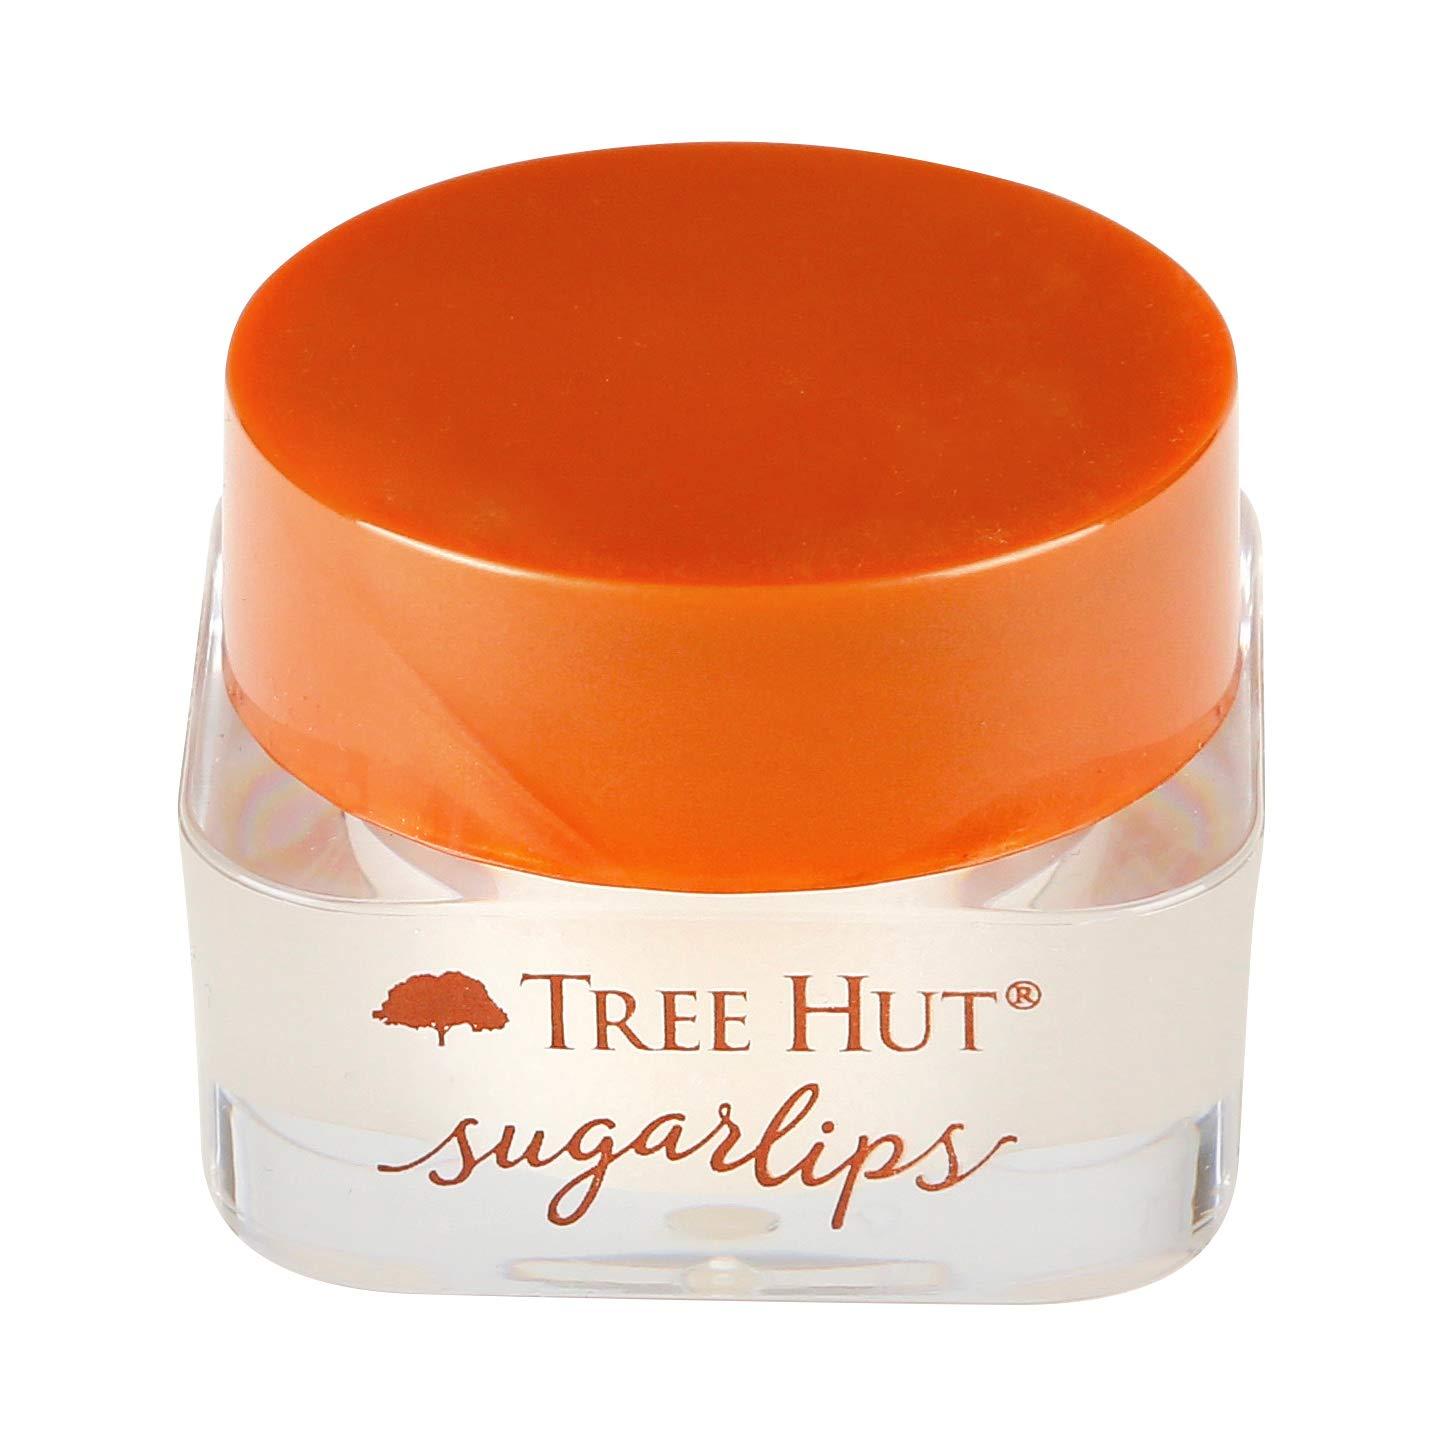 Tree Hut Sugar Lips Lip Scrub, 0.34oz, Ultra Hydrating Lip Scrub for Nourishing Essential Lip Care